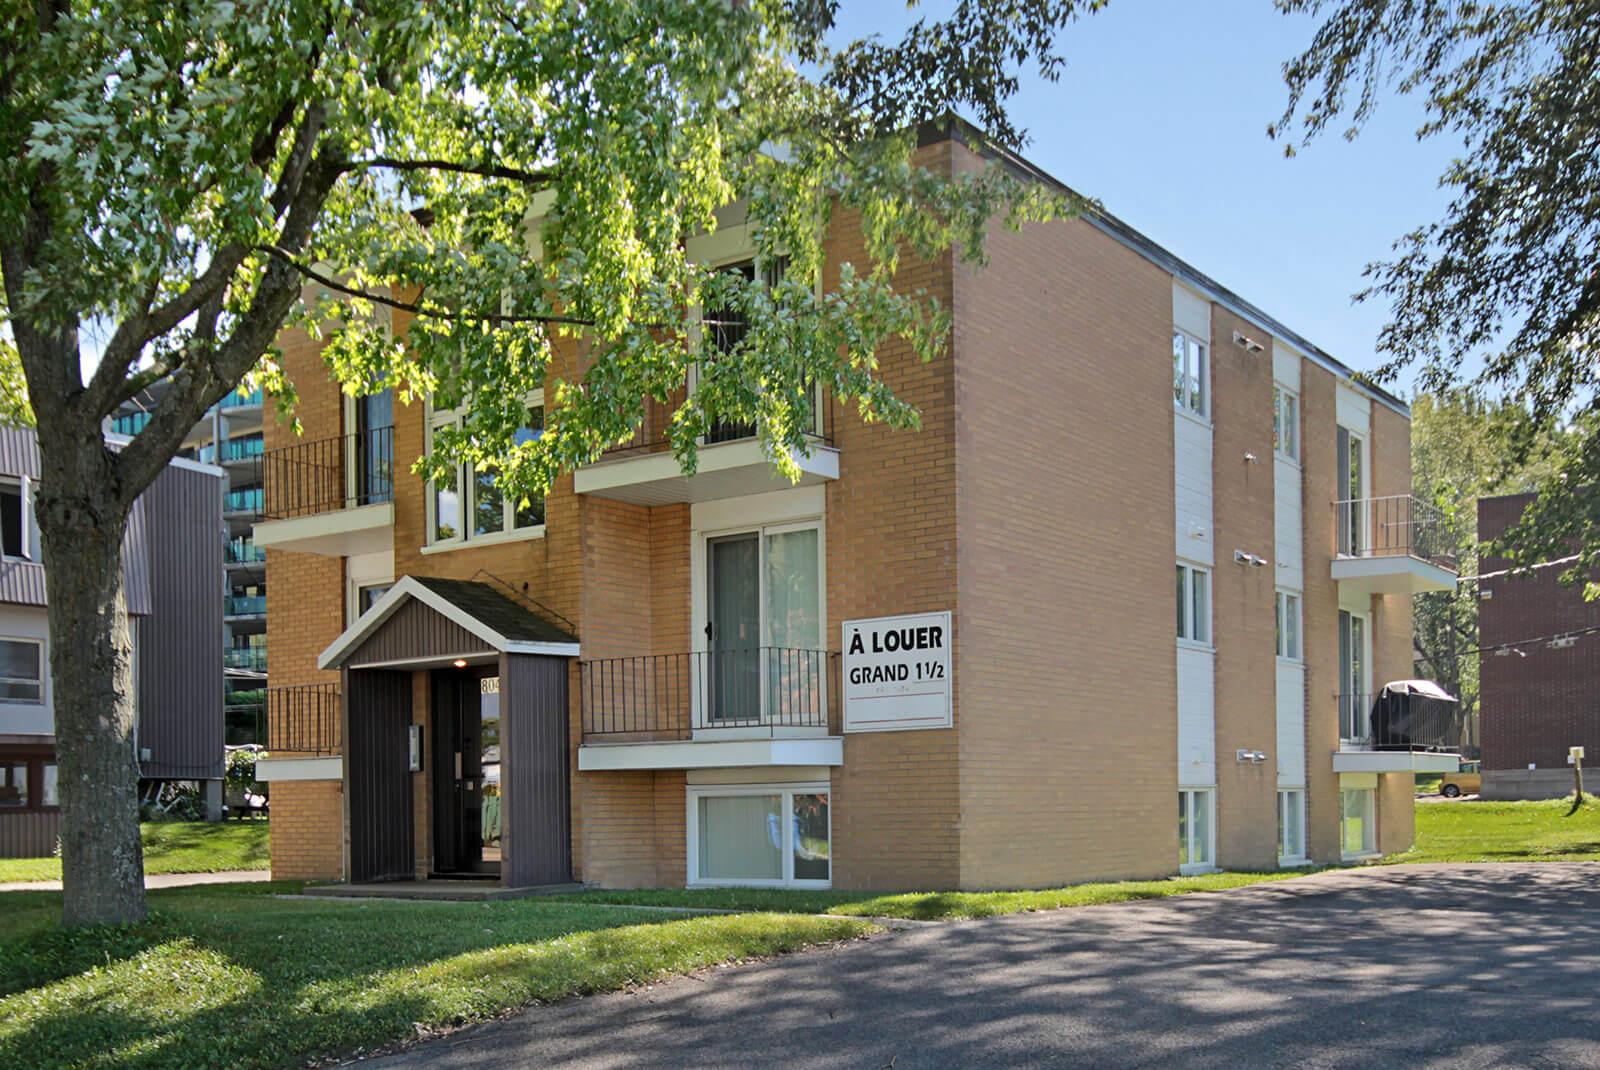 804, Beauregard - Immeubles Simard